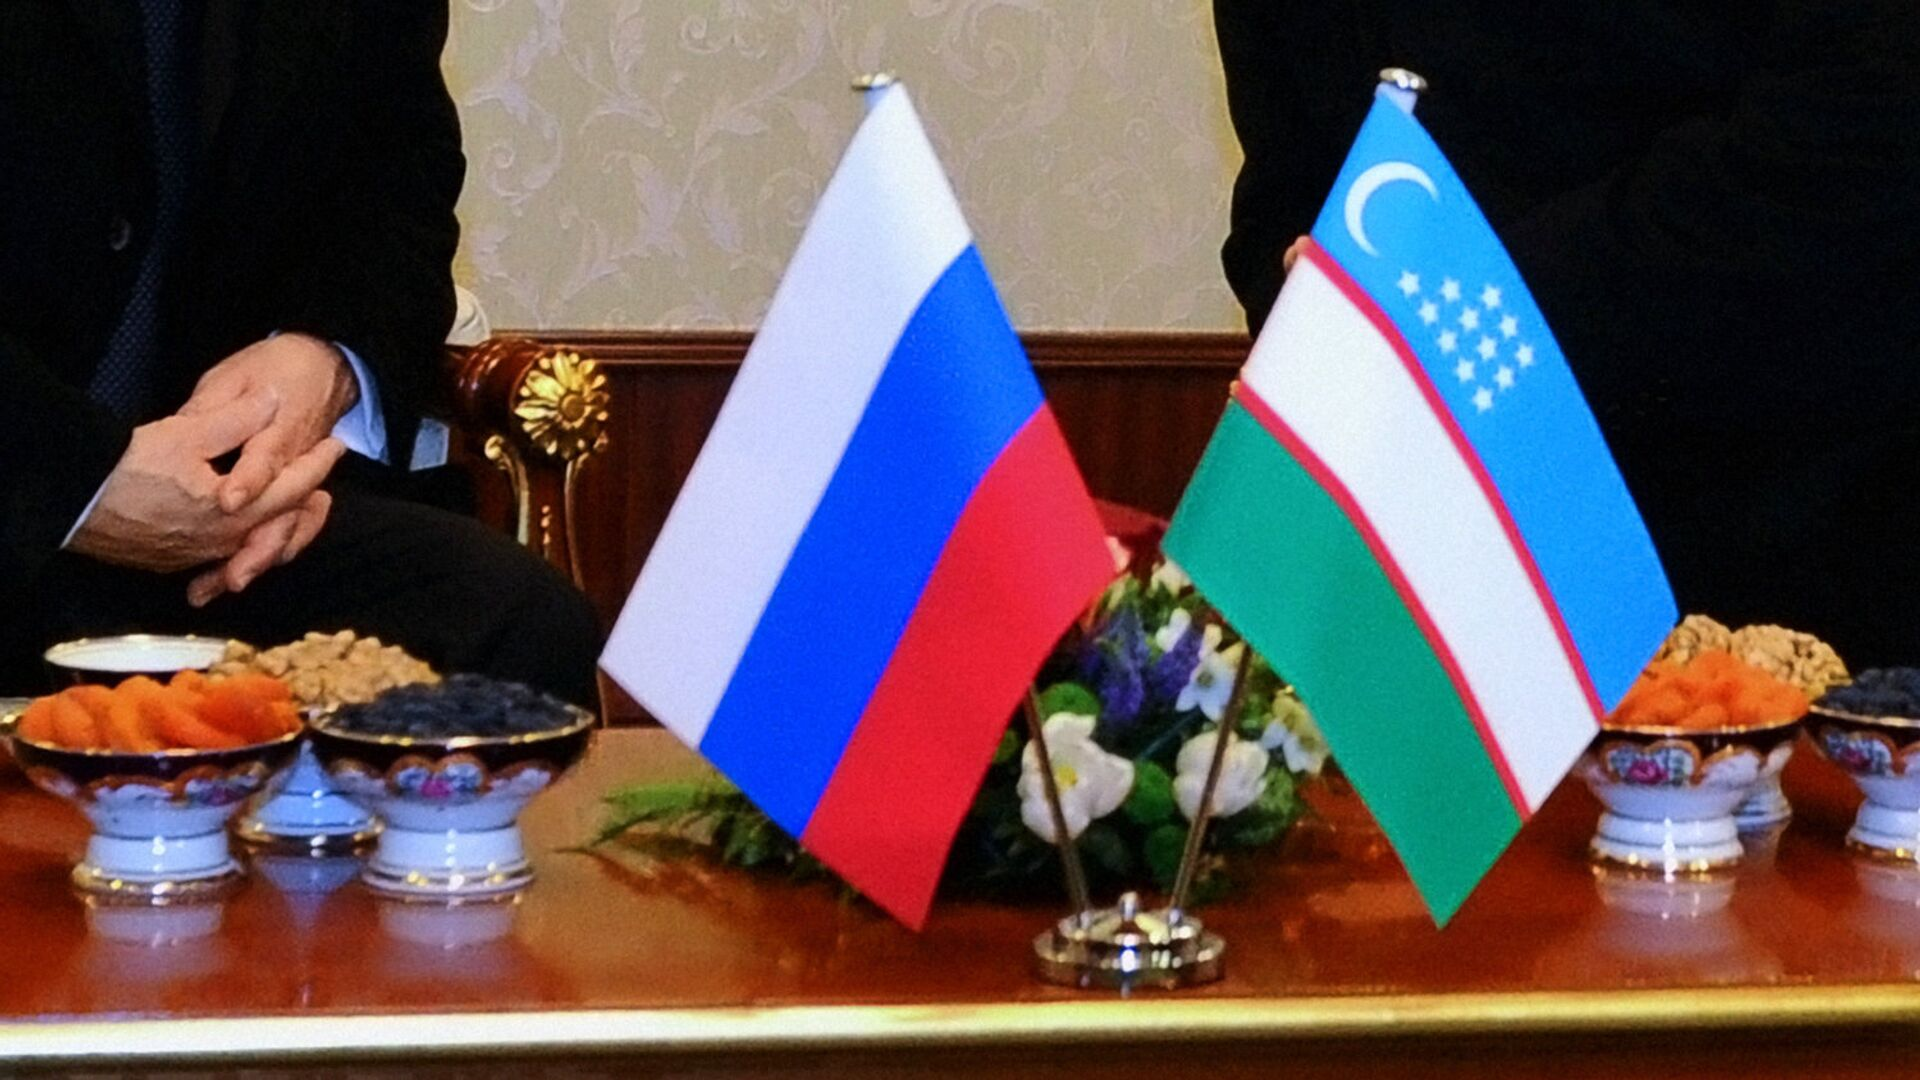 Флаги России и Узбекистана - Sputnik Ўзбекистон, 1920, 22.09.2021